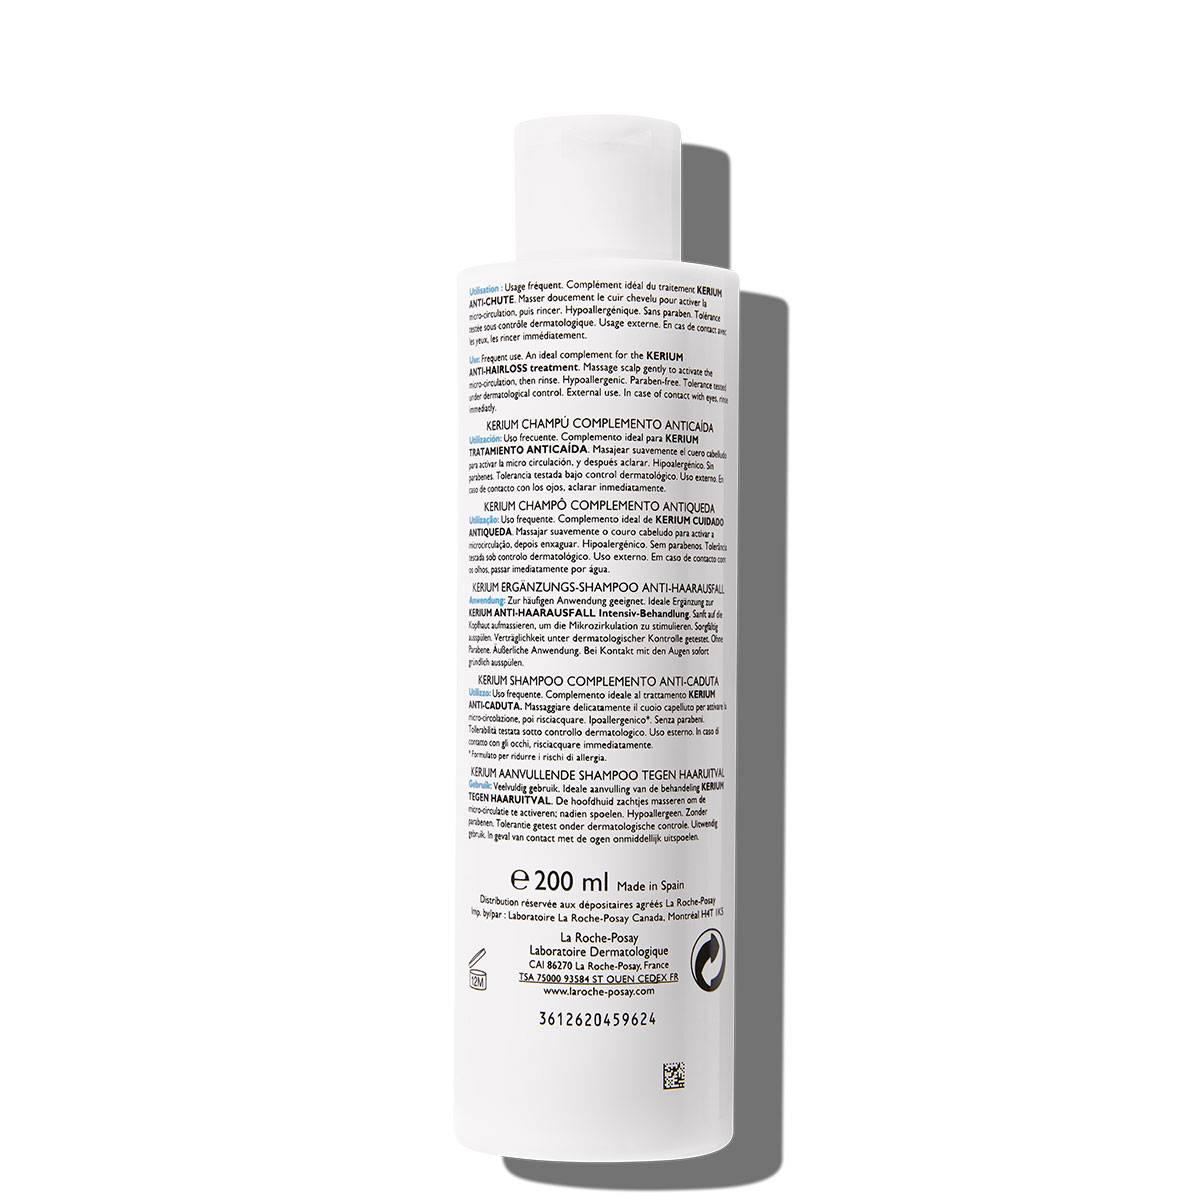 Kerium Anti Hairloss Shampoo Complement 200ml